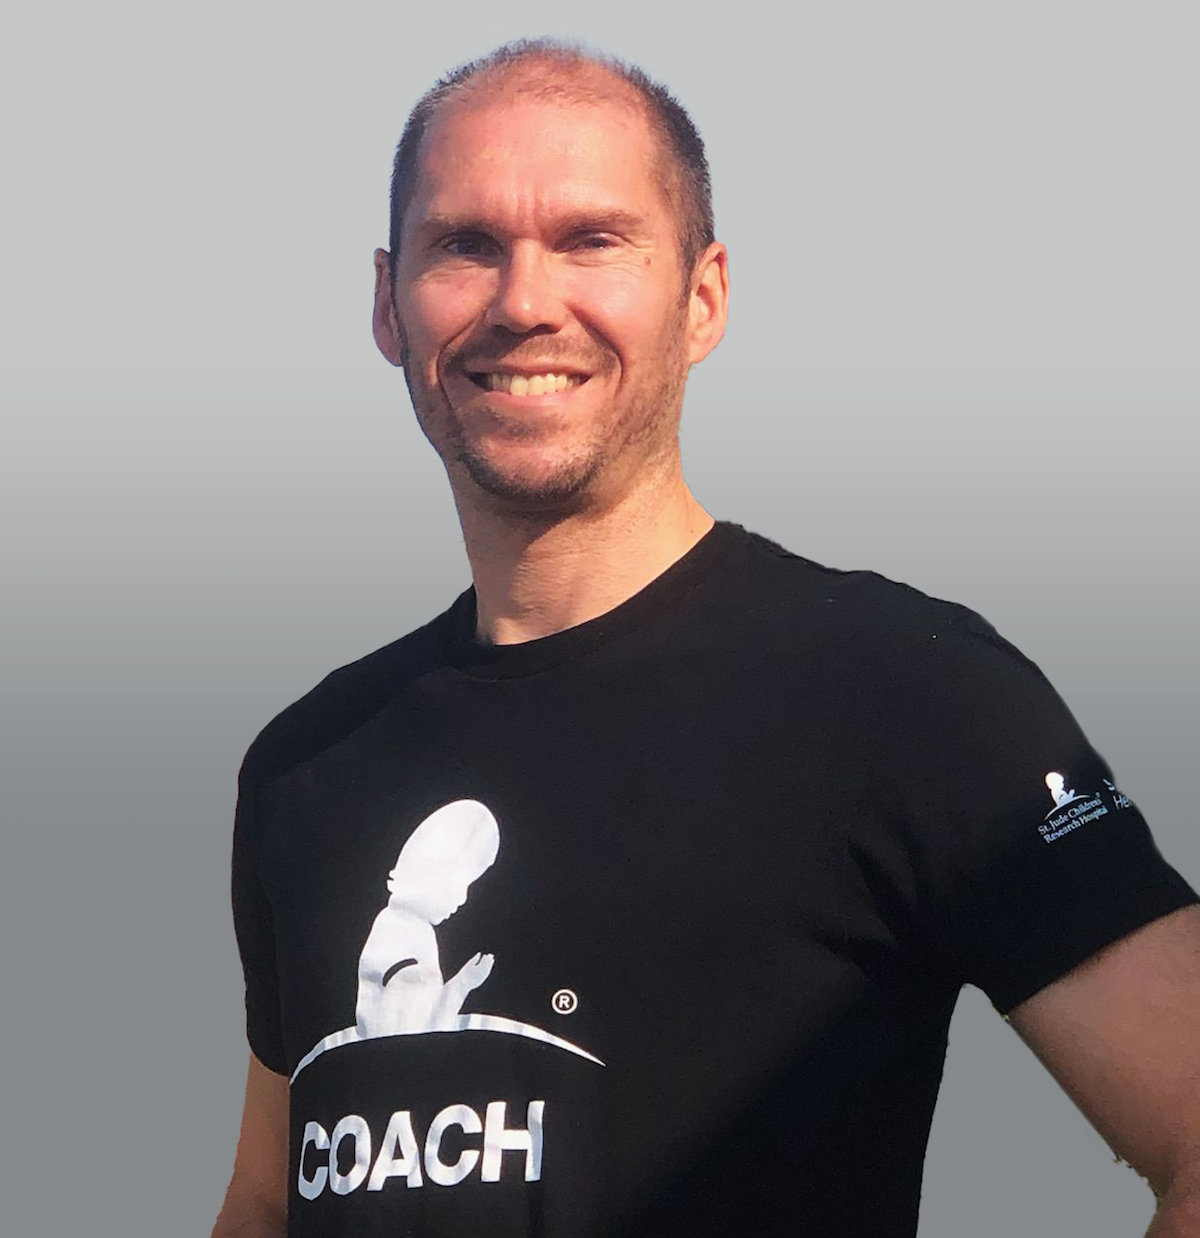 Coach Stephen